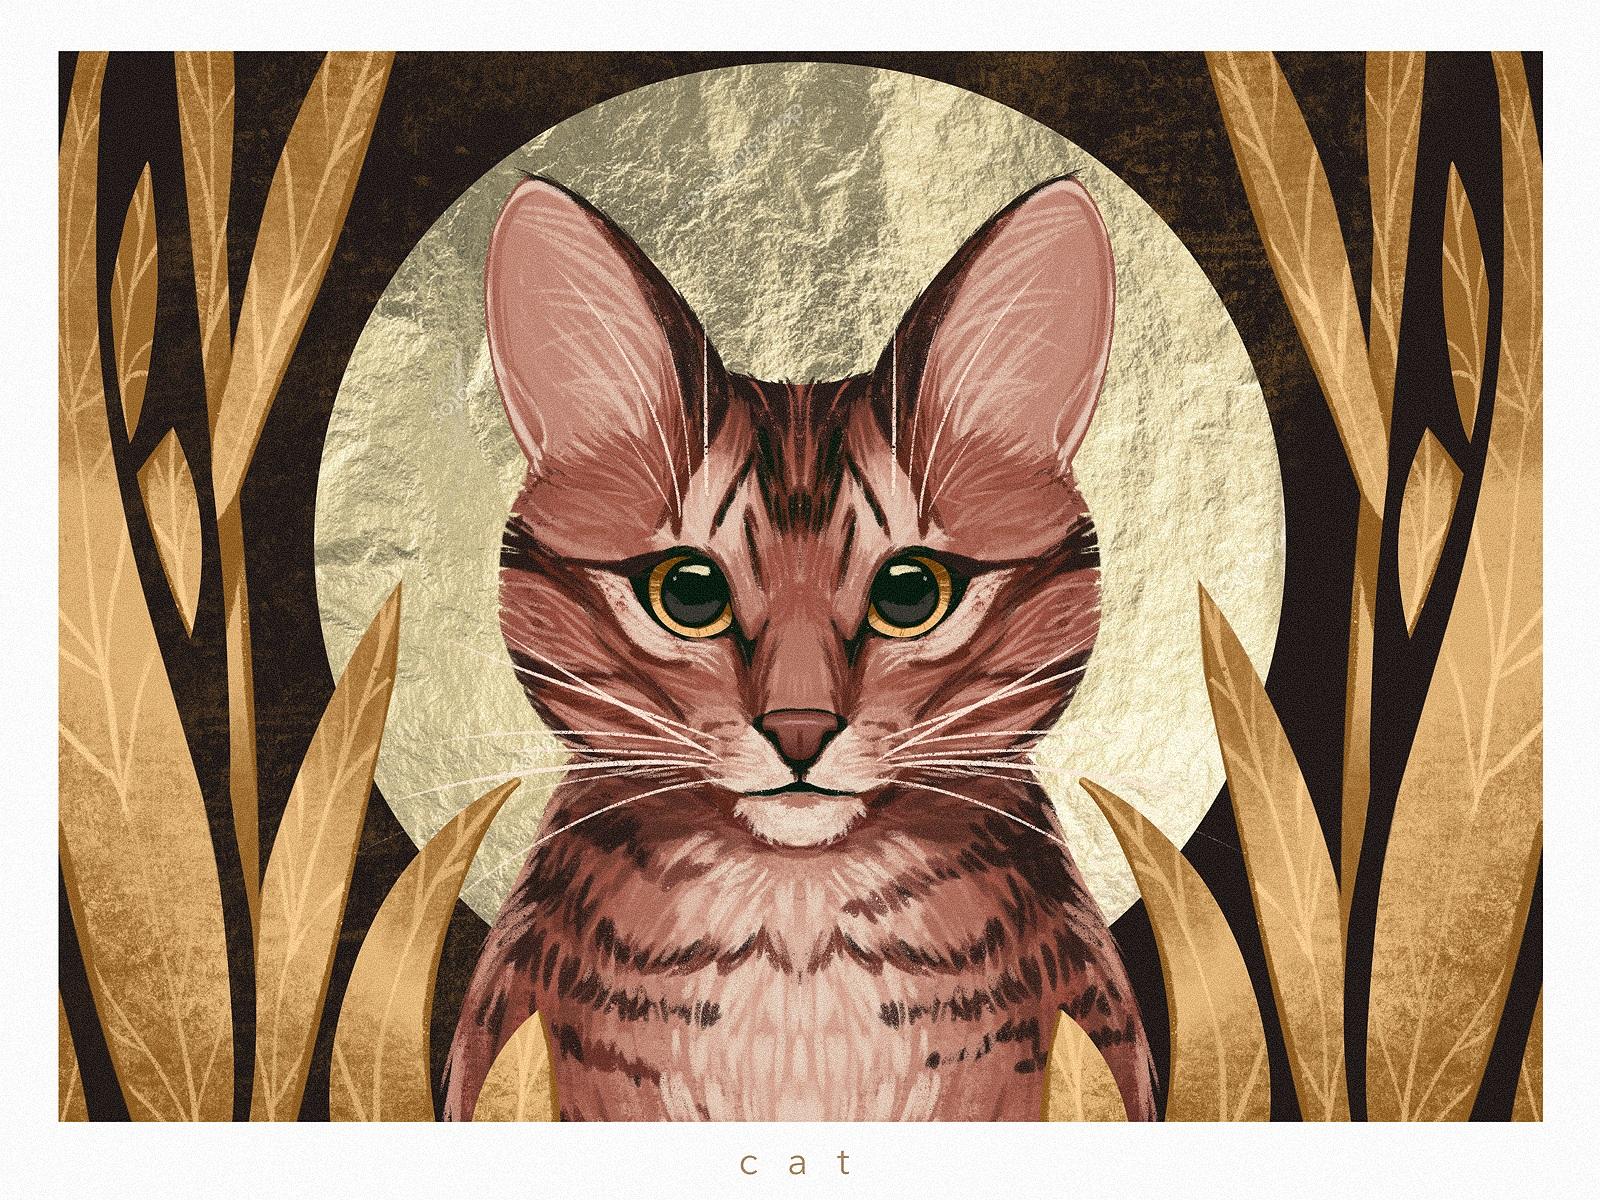 animal cat portrait illustration tubikarts